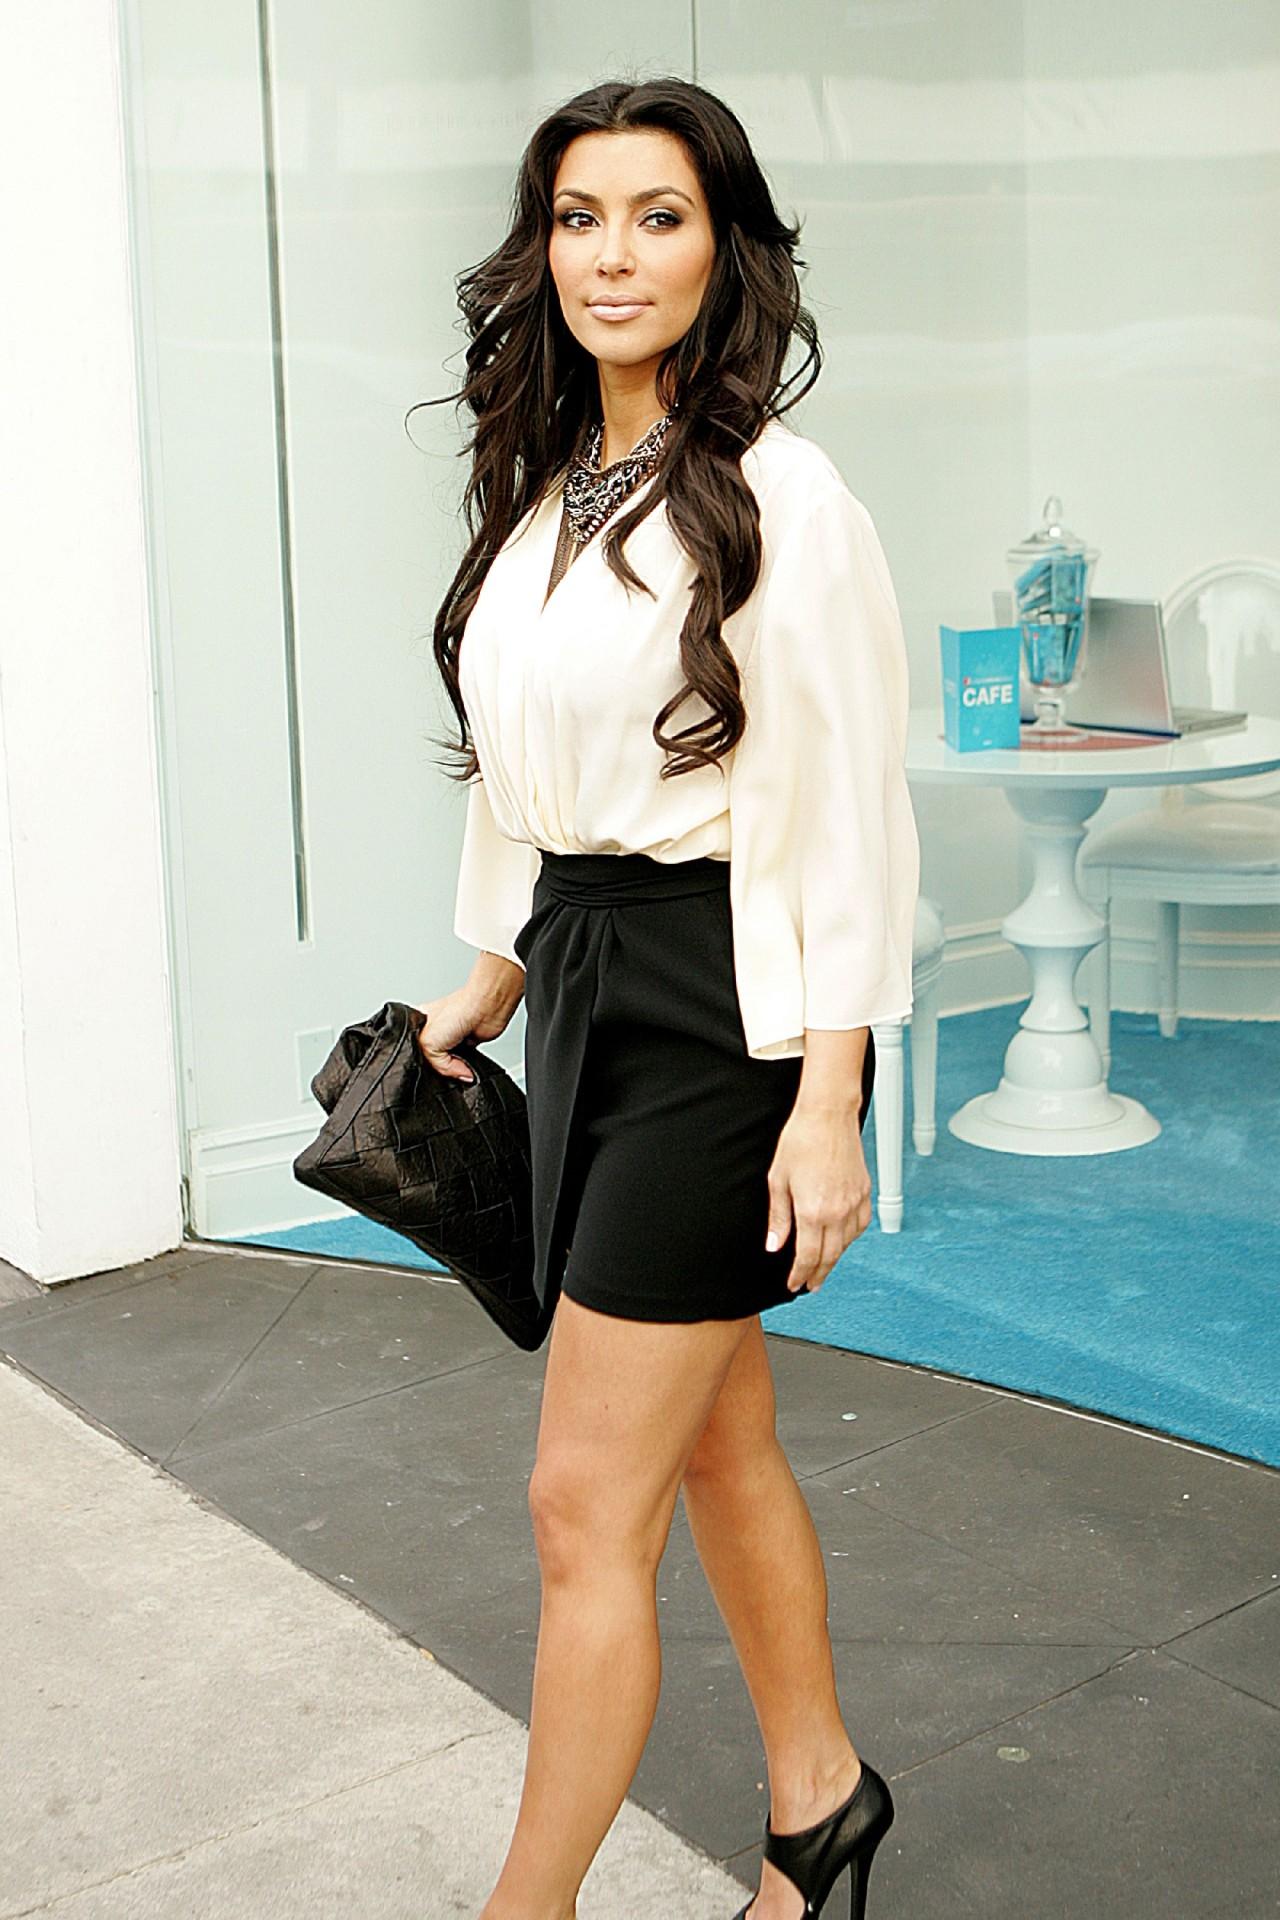 January 9th, 2010 - Shopping on Melrose Avenue #kim kardashian#2010#candids#kkw#kuwtk